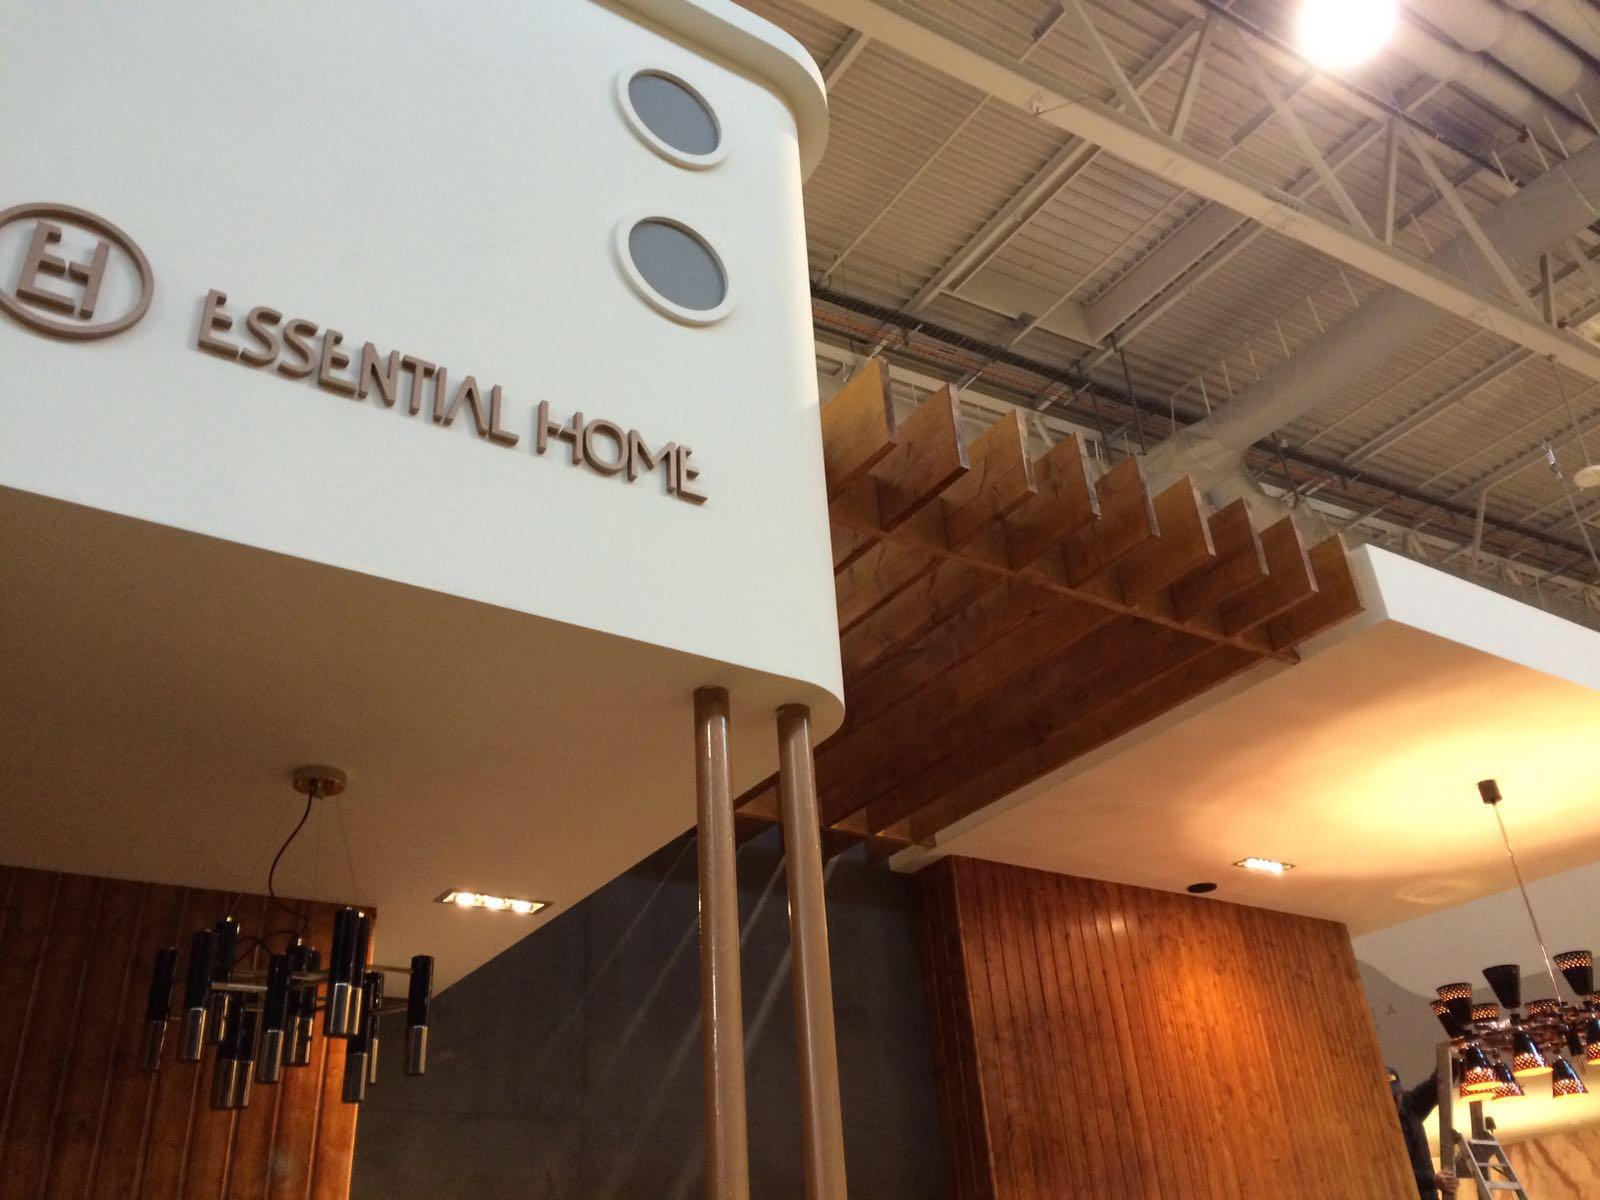 maison objet 2016 Preview Maison Objet 2016: Essential Home MidCentury New Brand 20160120102055 1